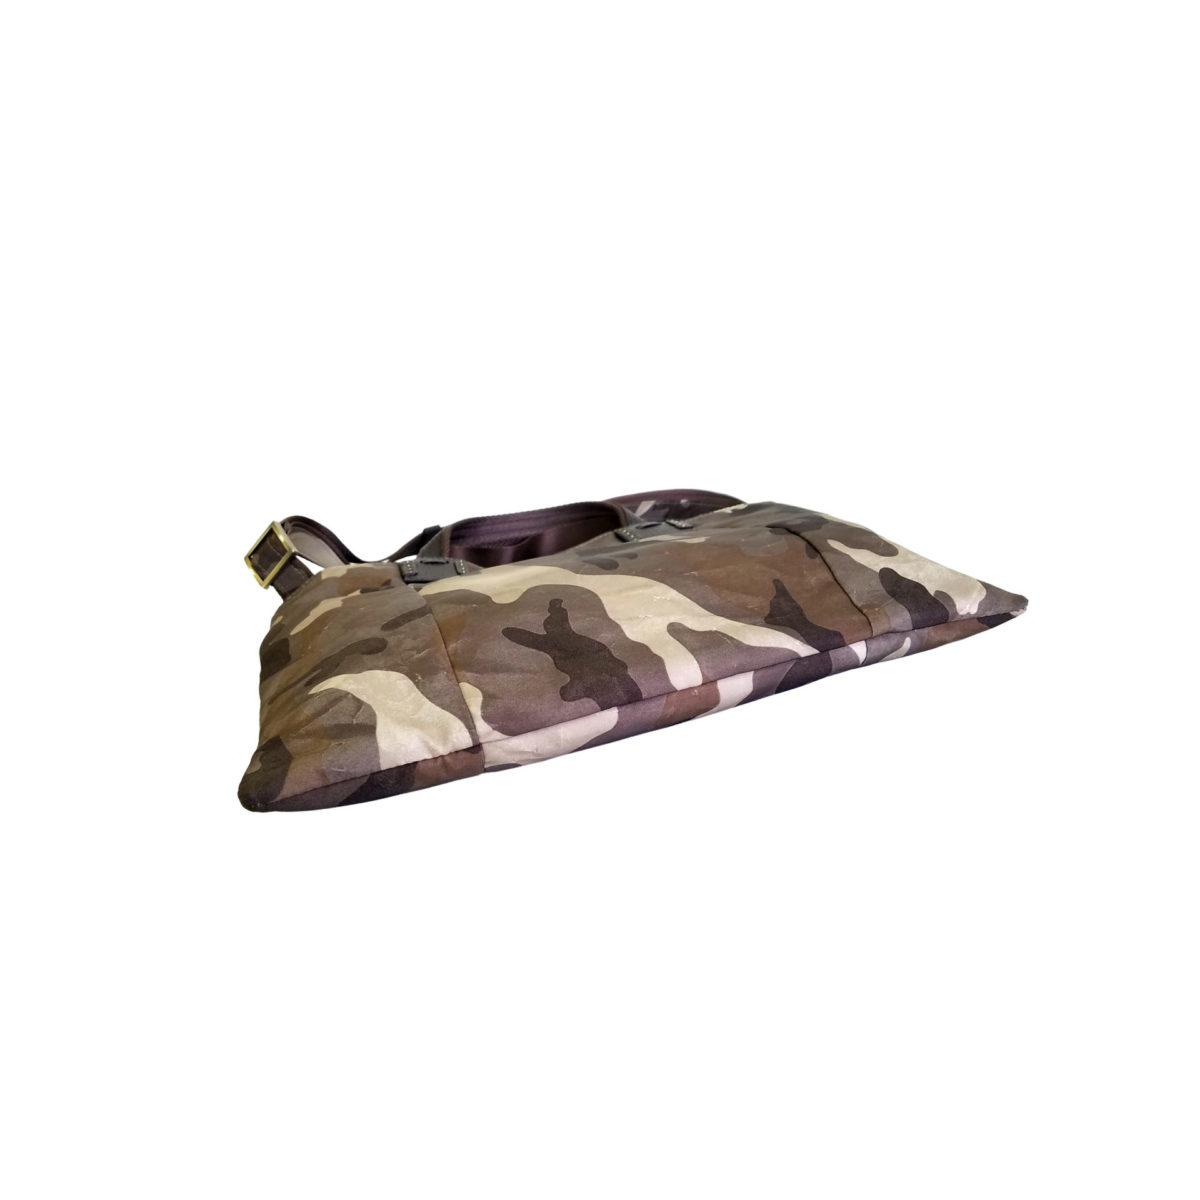 Camouflage Cerberus 3 face sacoche